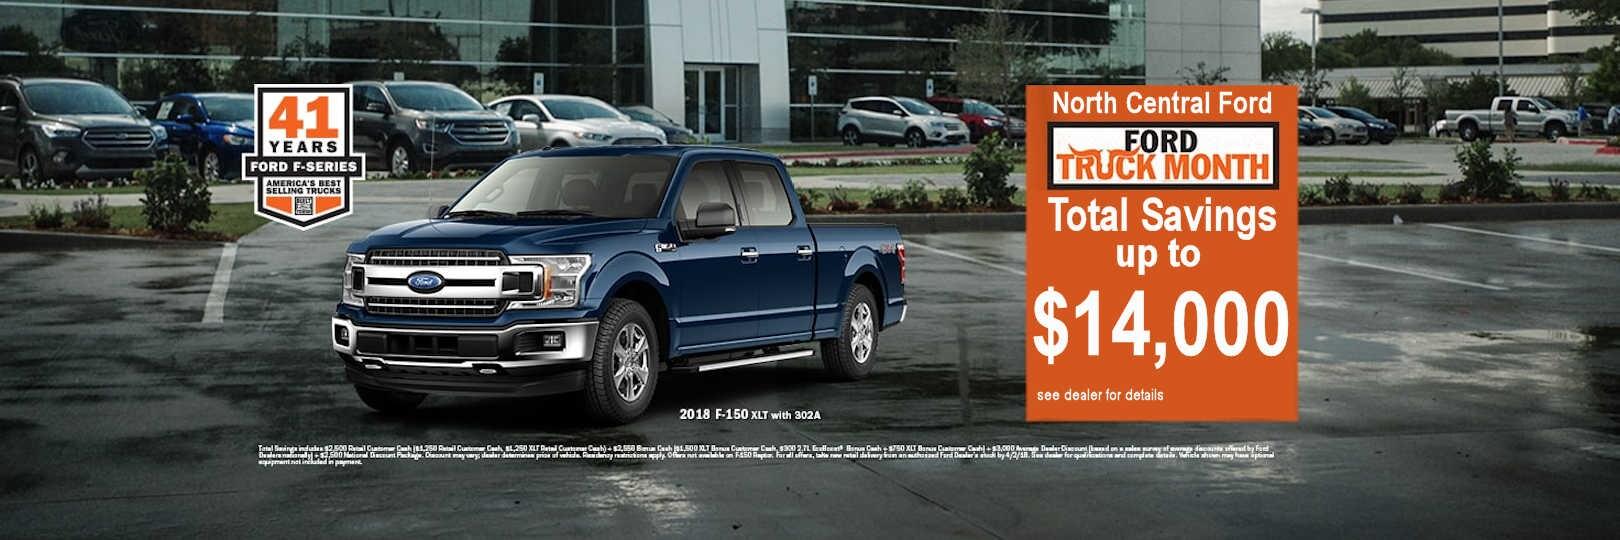 North Central Ford Near Dallas New Used Ford Dealership - Ford dallas